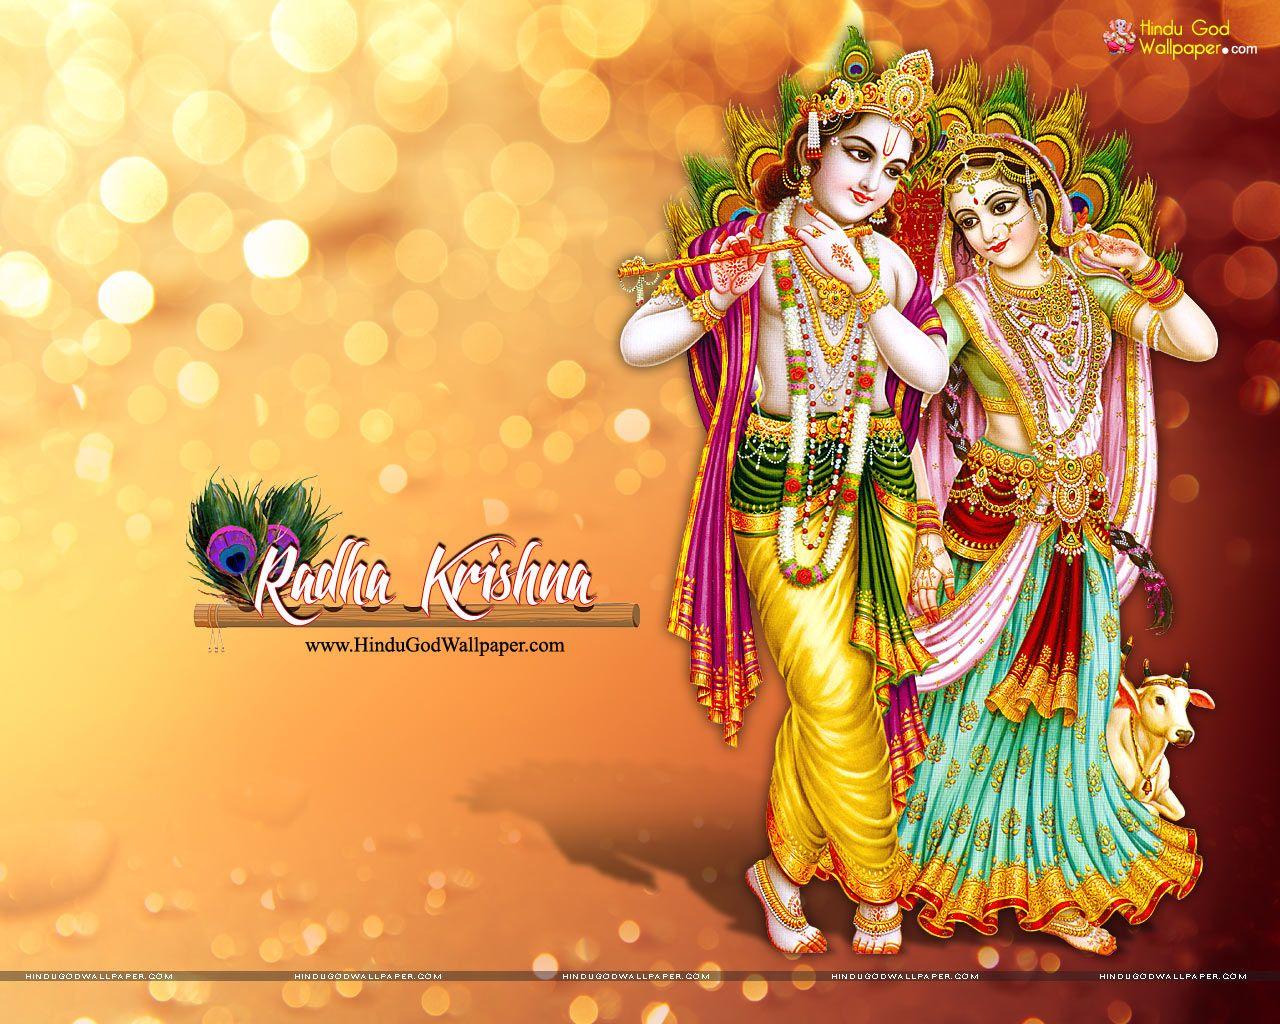 Radha Krishna High Resolution Hd Wallpapers Download Indian Gods